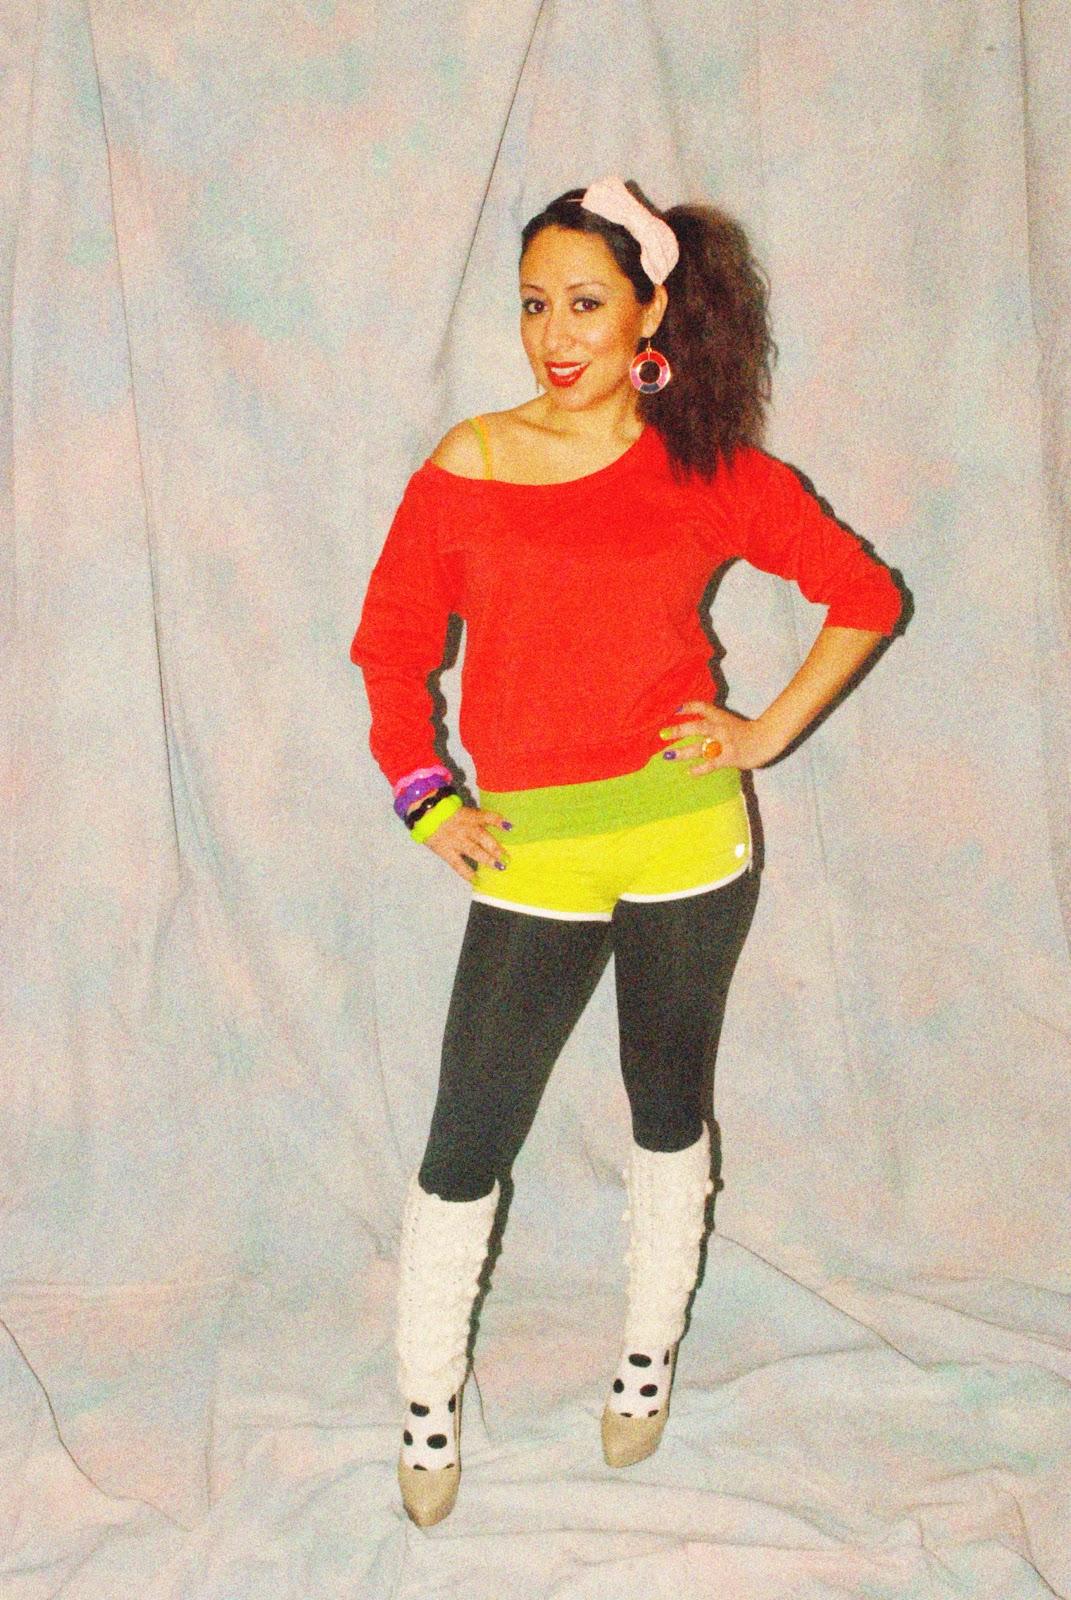 dazzling spice 80s theme